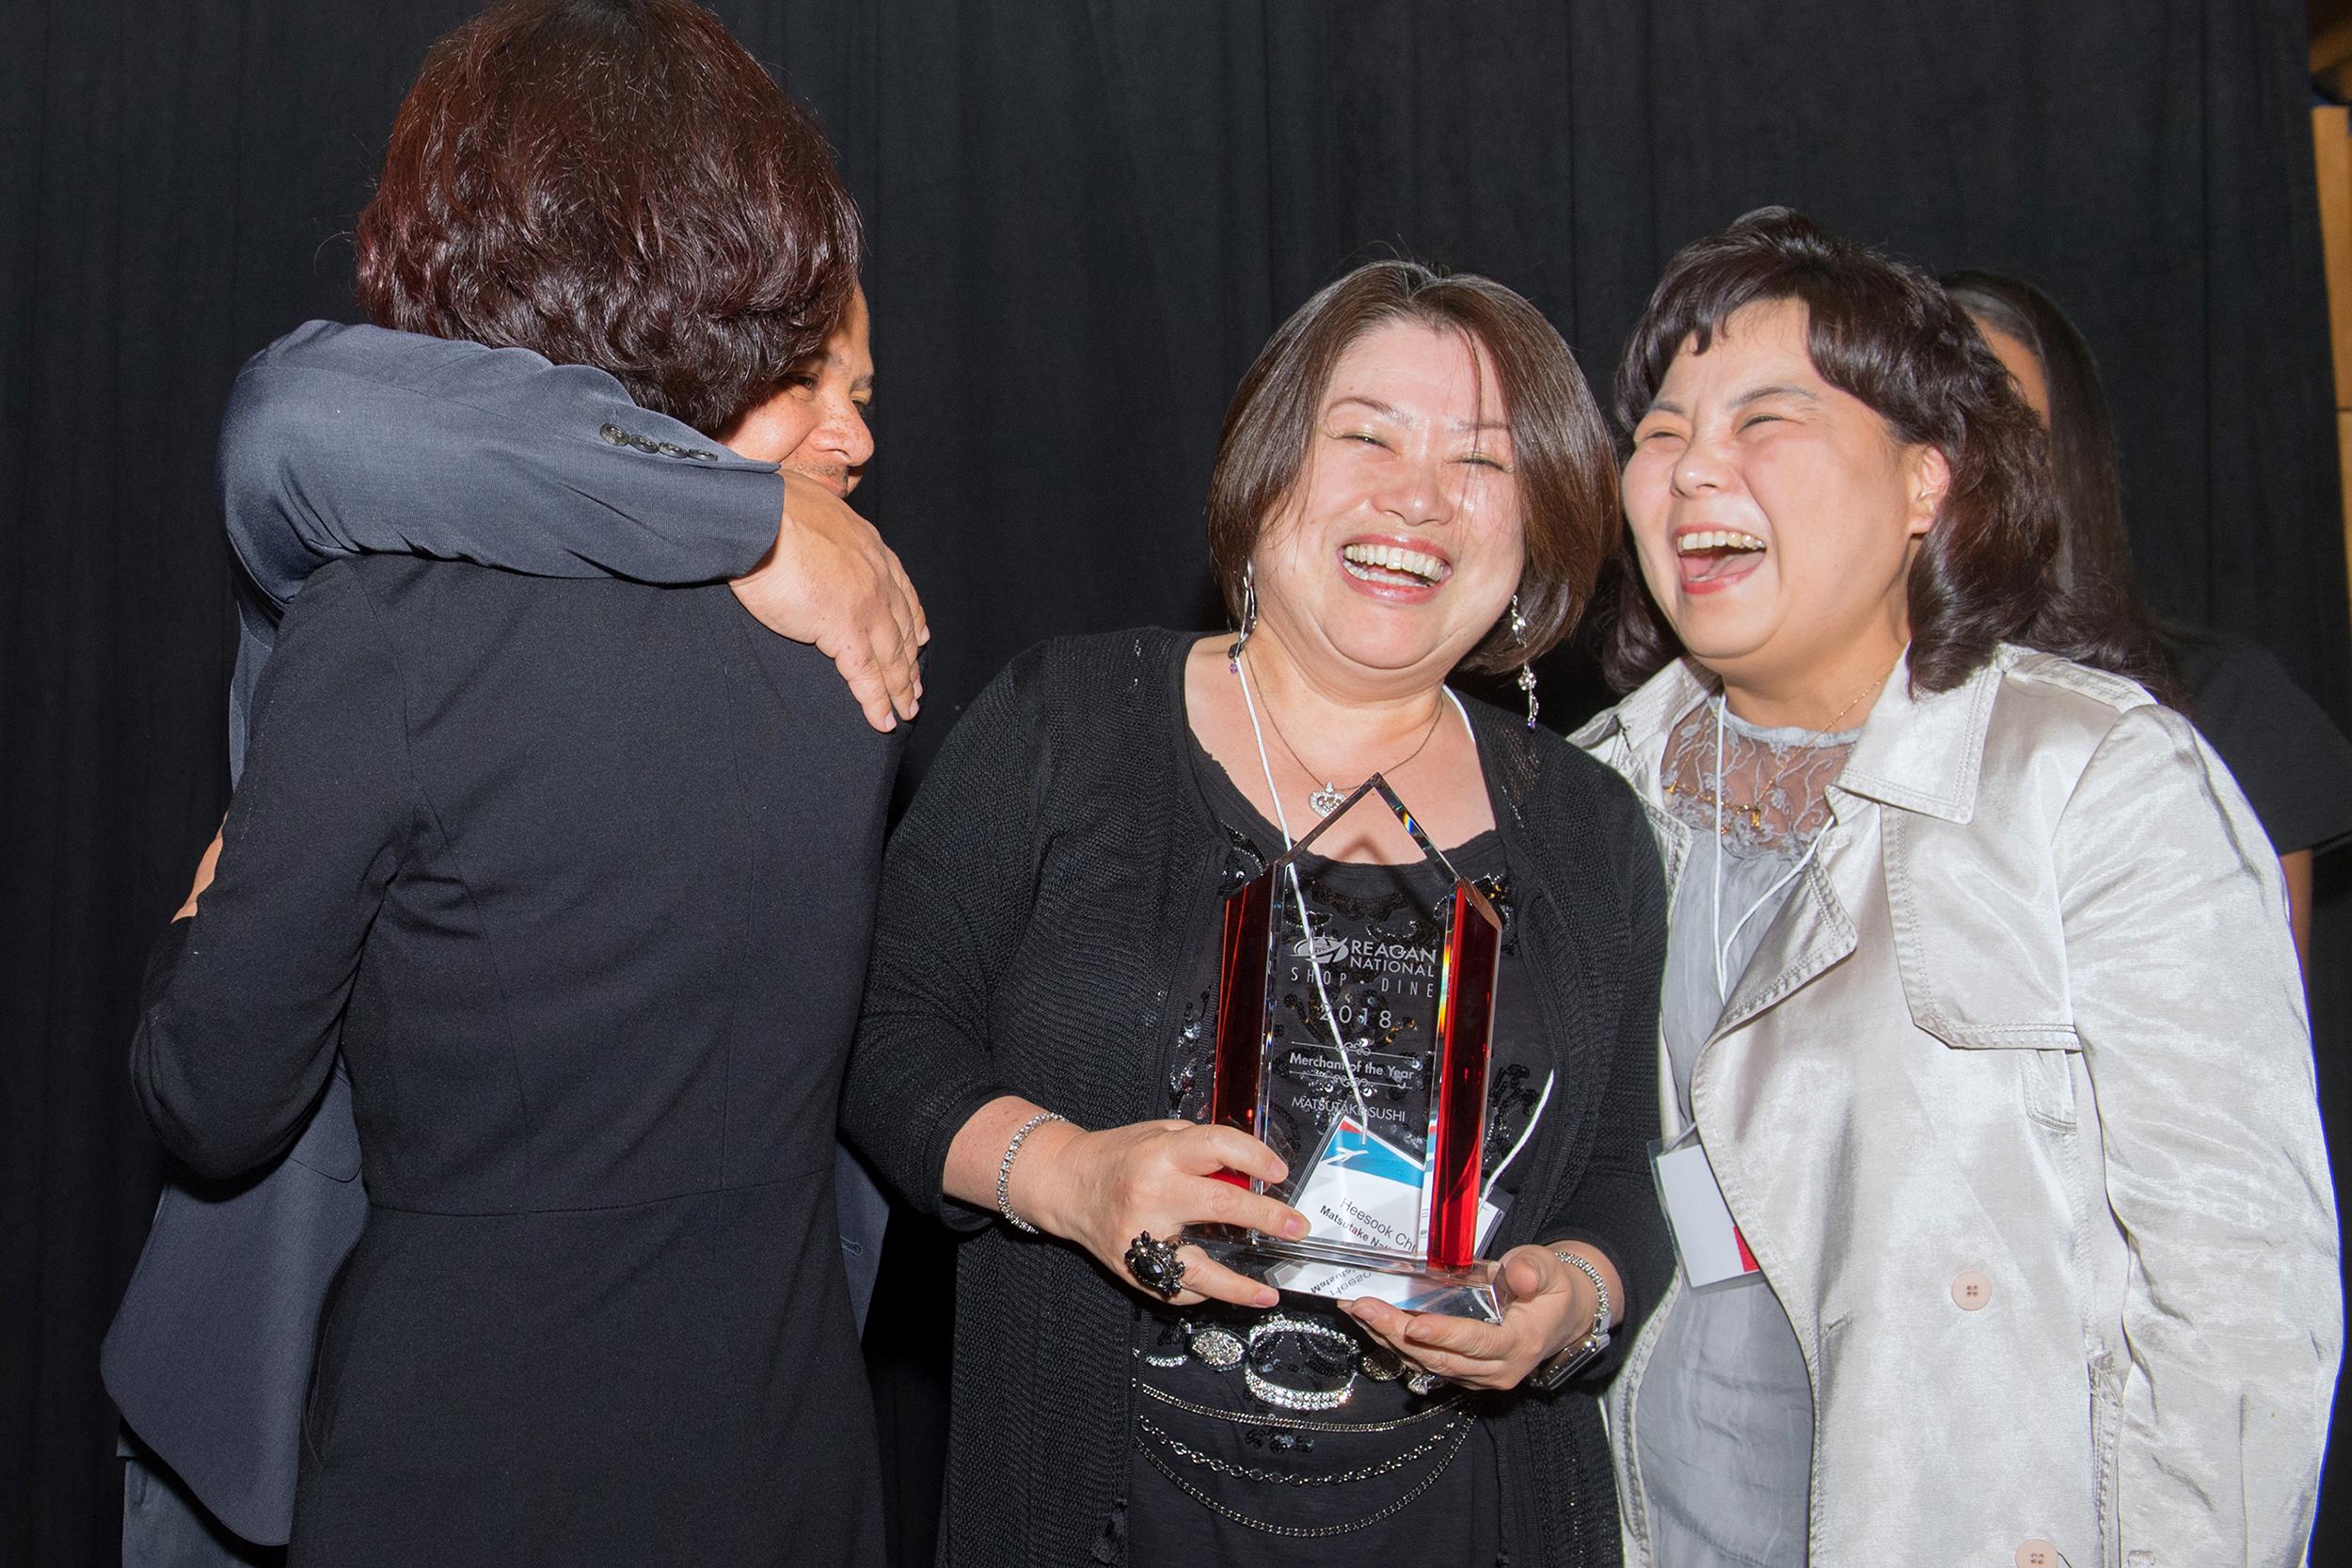 Heesook Chun, owner of Matsutake Sushi, accepting Reagan National Merchant of the Year award